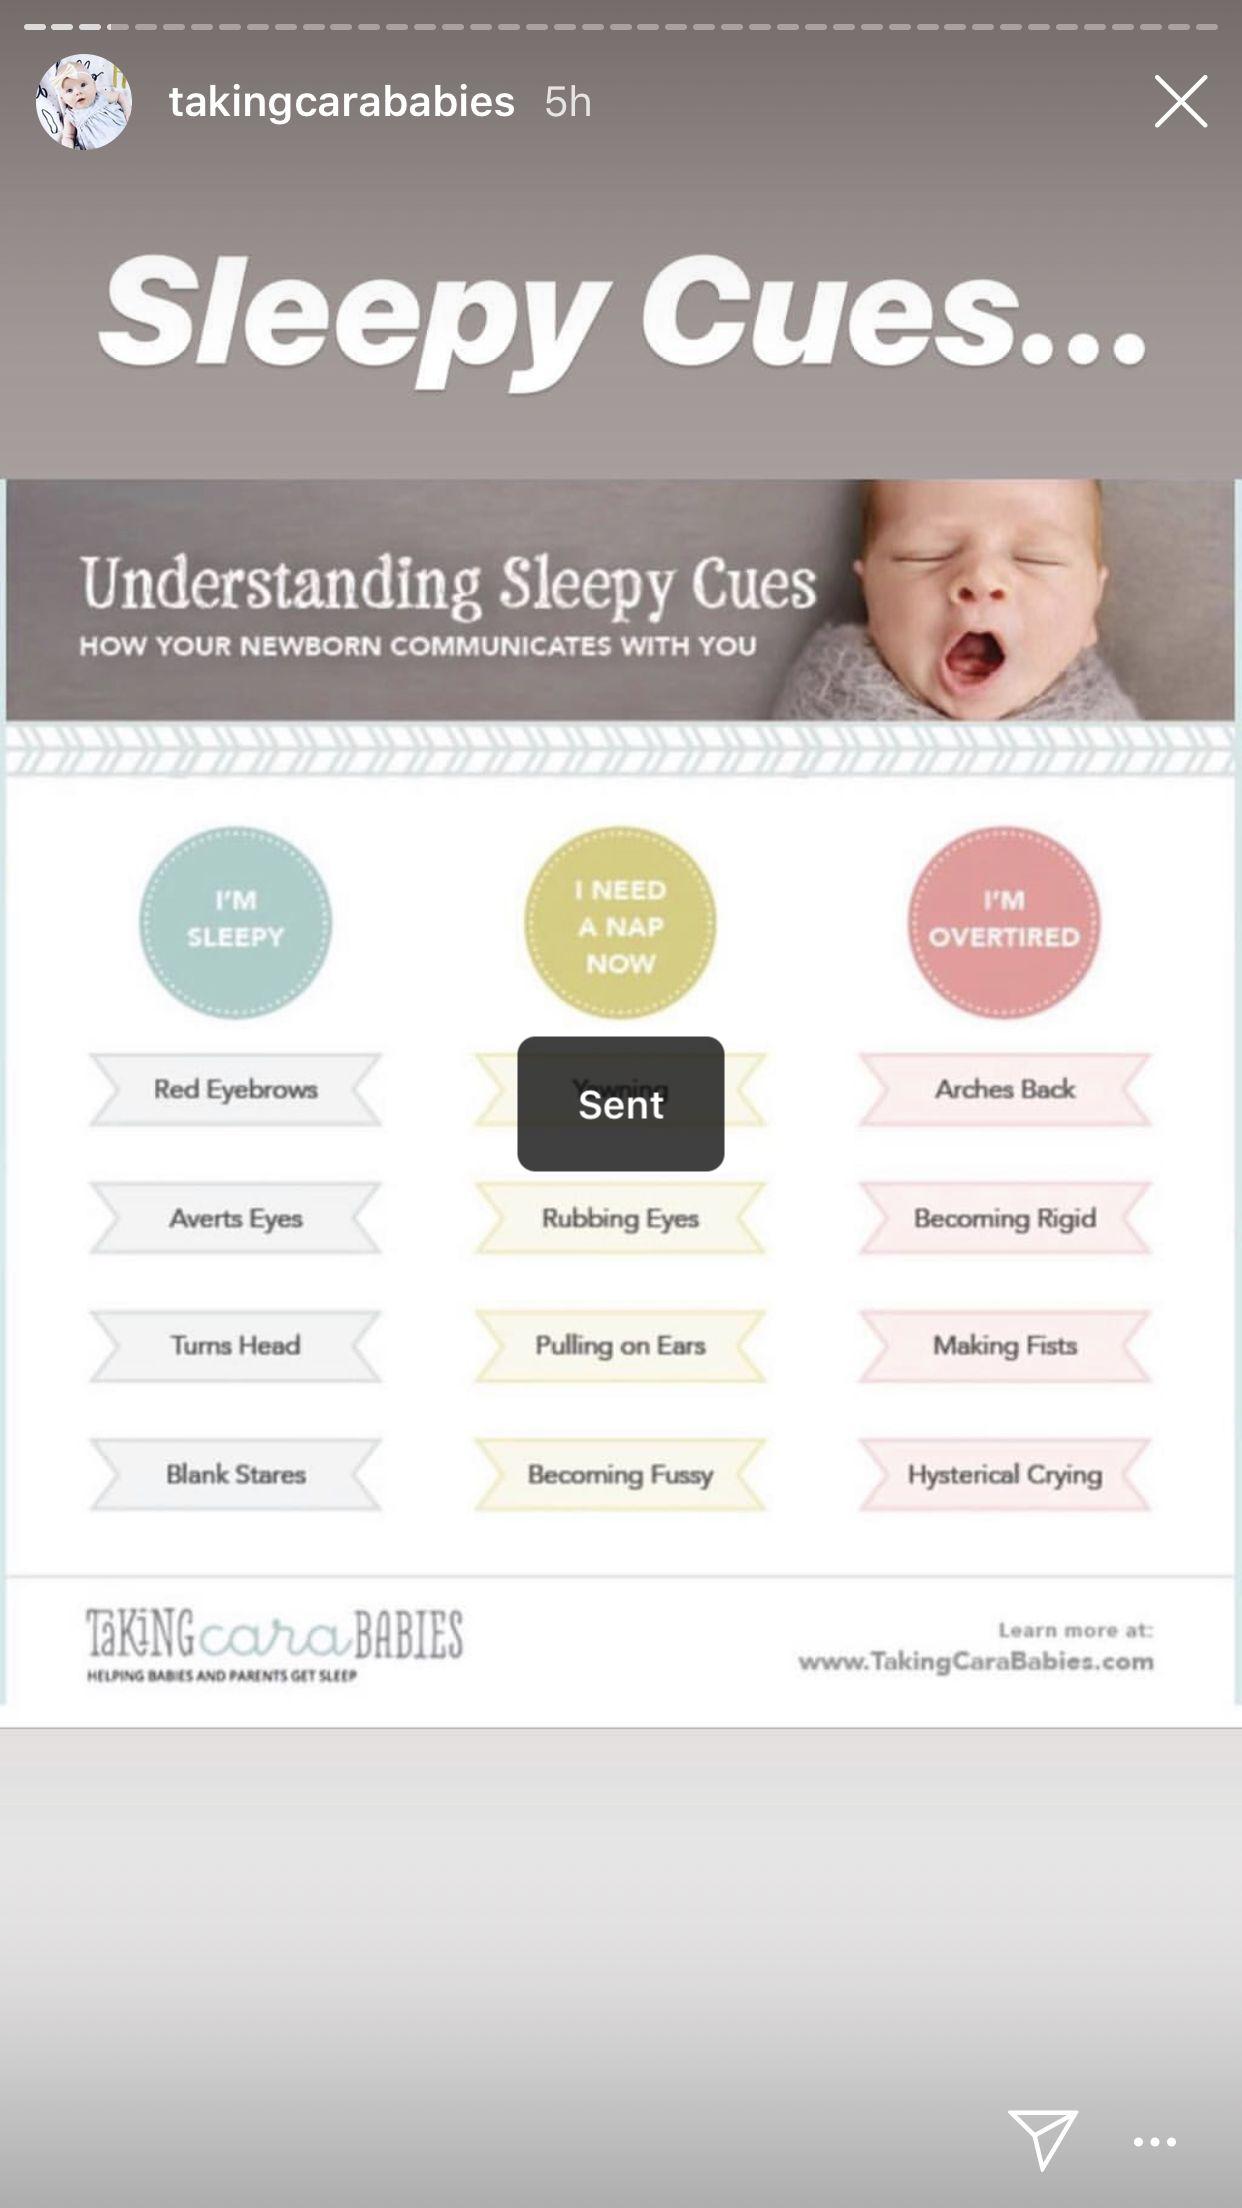 Taking cara babies | Sleep training baby, Baby learning ...